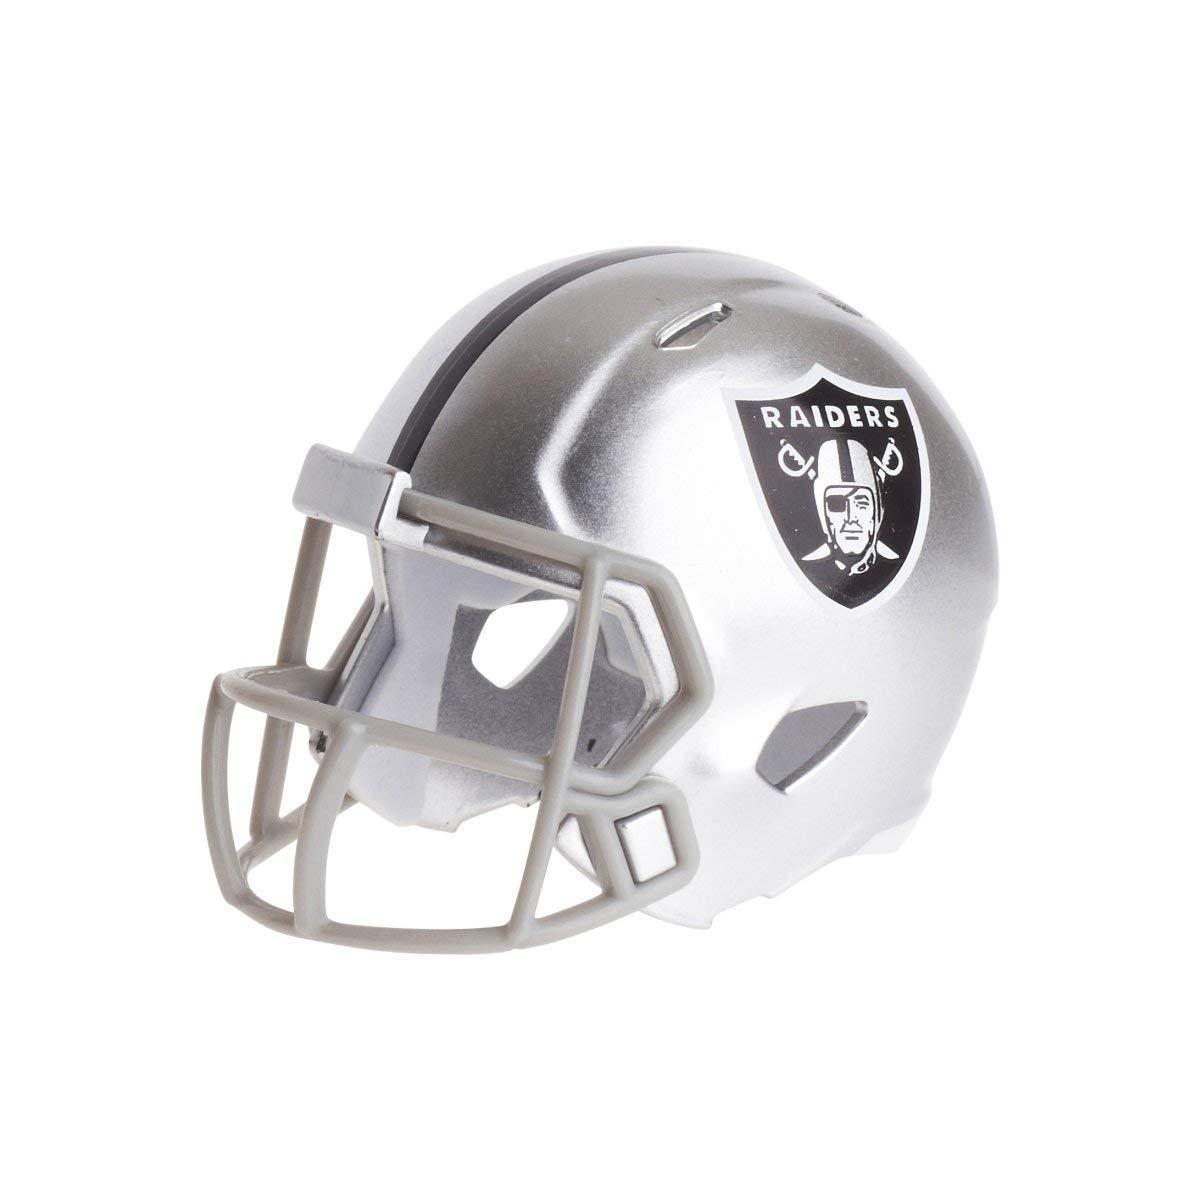 Riddell Oakland Raiders Mini-Speed Pocket Pro Micro/Kamerahandys/Football Helm 095855320694